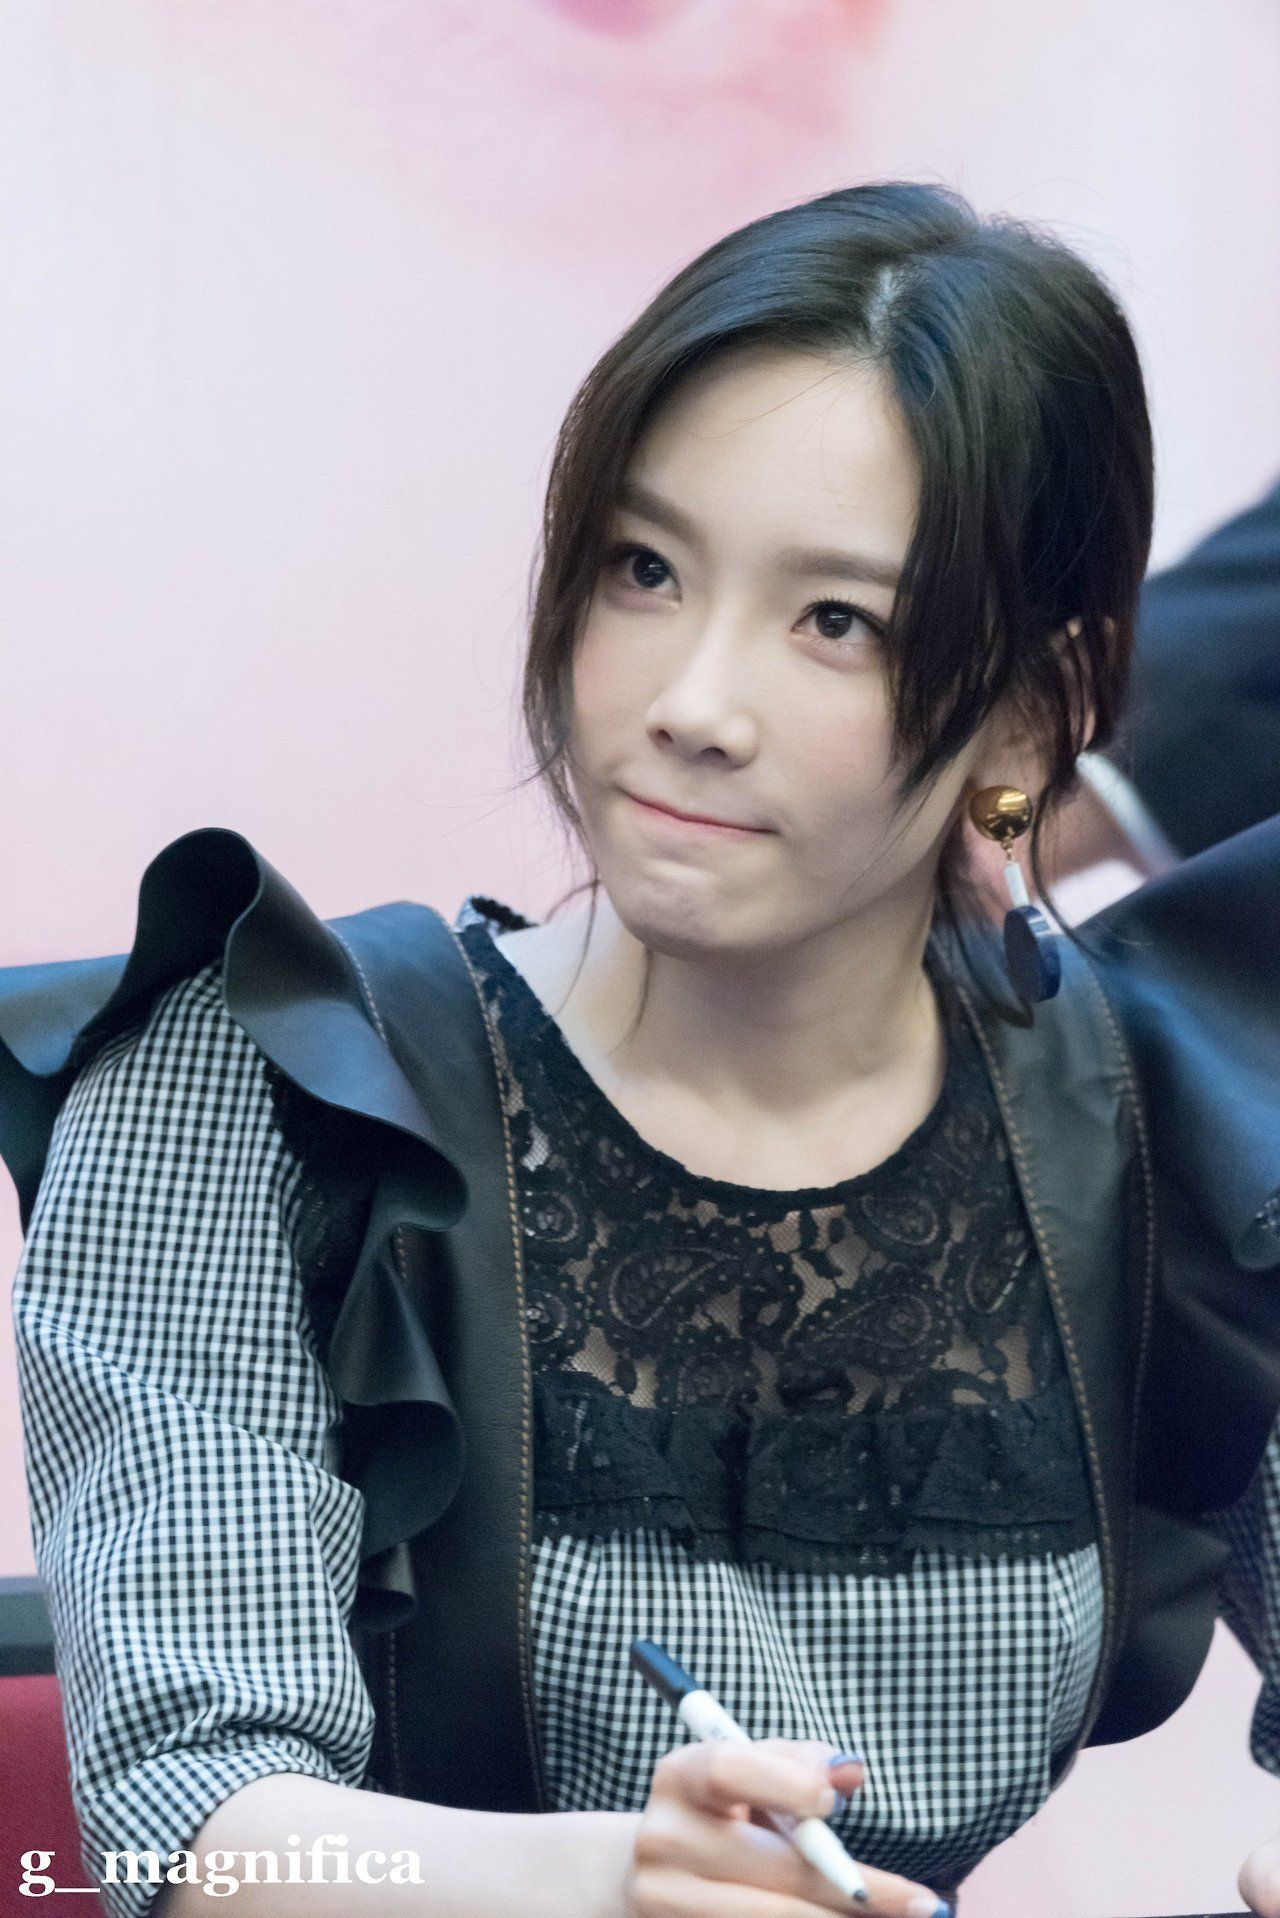 FY-GG 》   Girls generation, Yuri, Wonder woman